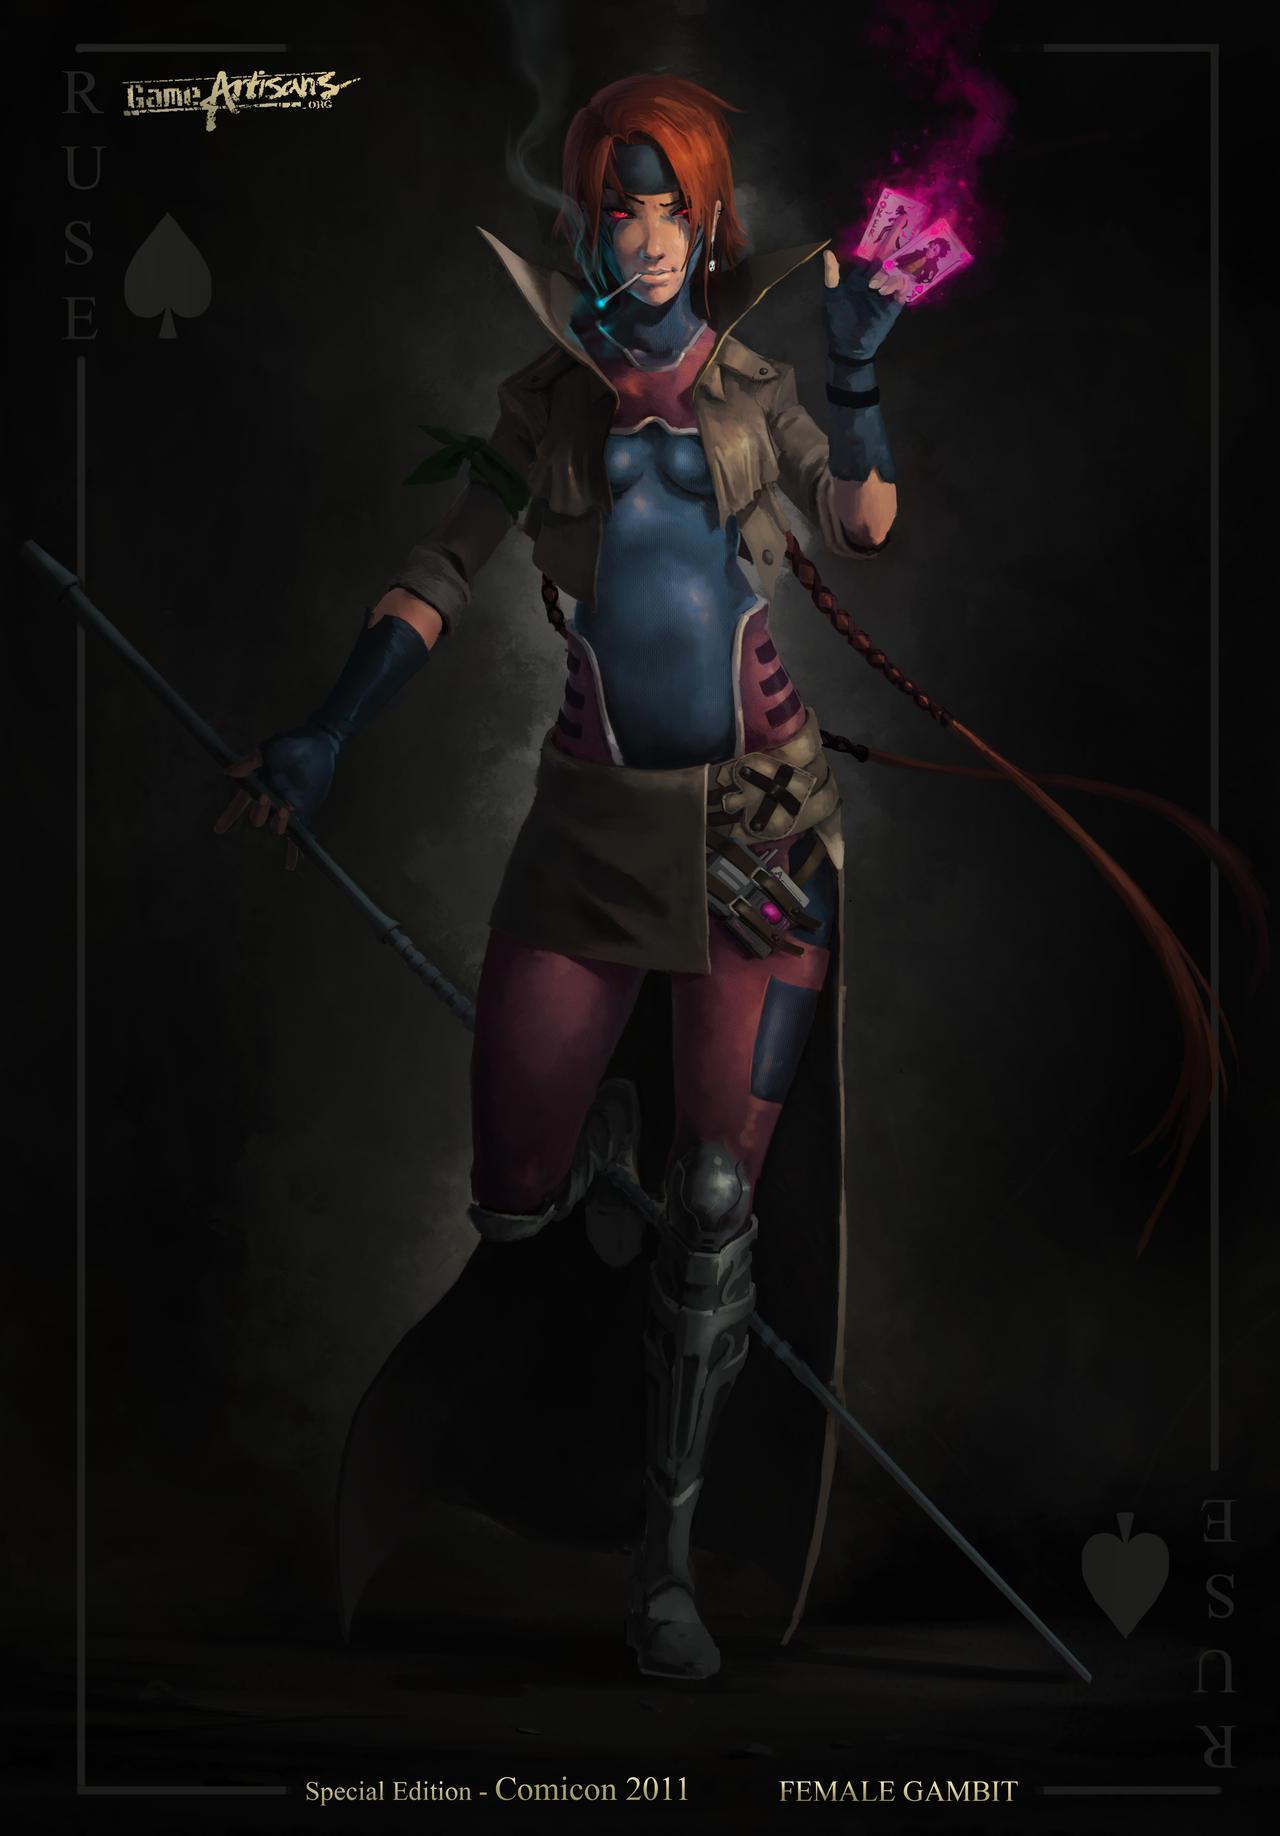 Female Gambit 'Ruse' by EleosInteractive